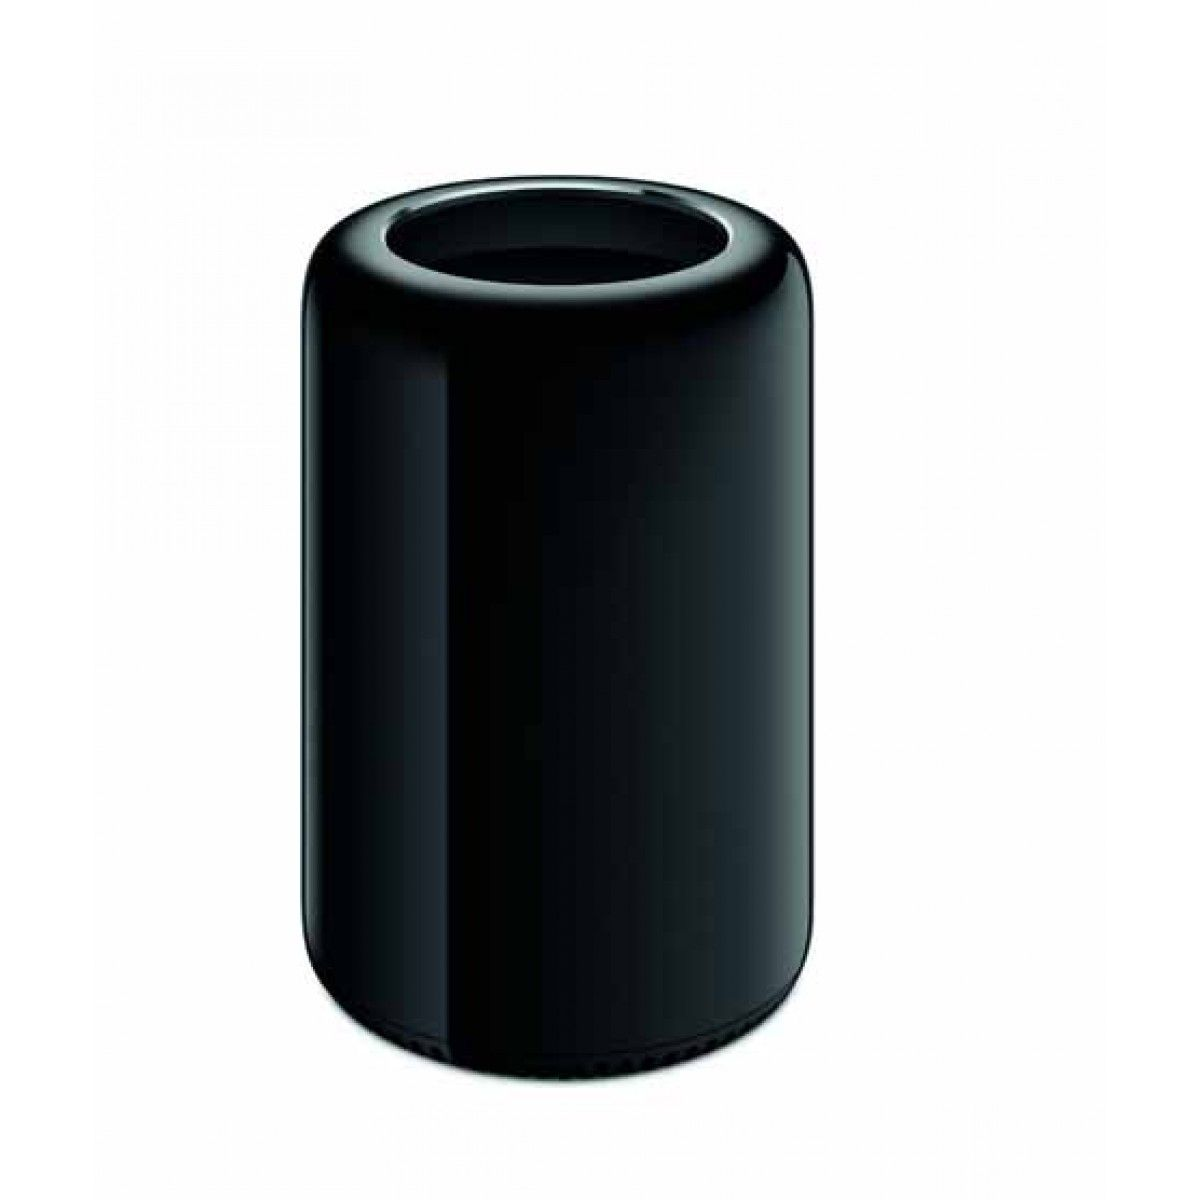 Apple Mac Pro (ME253)